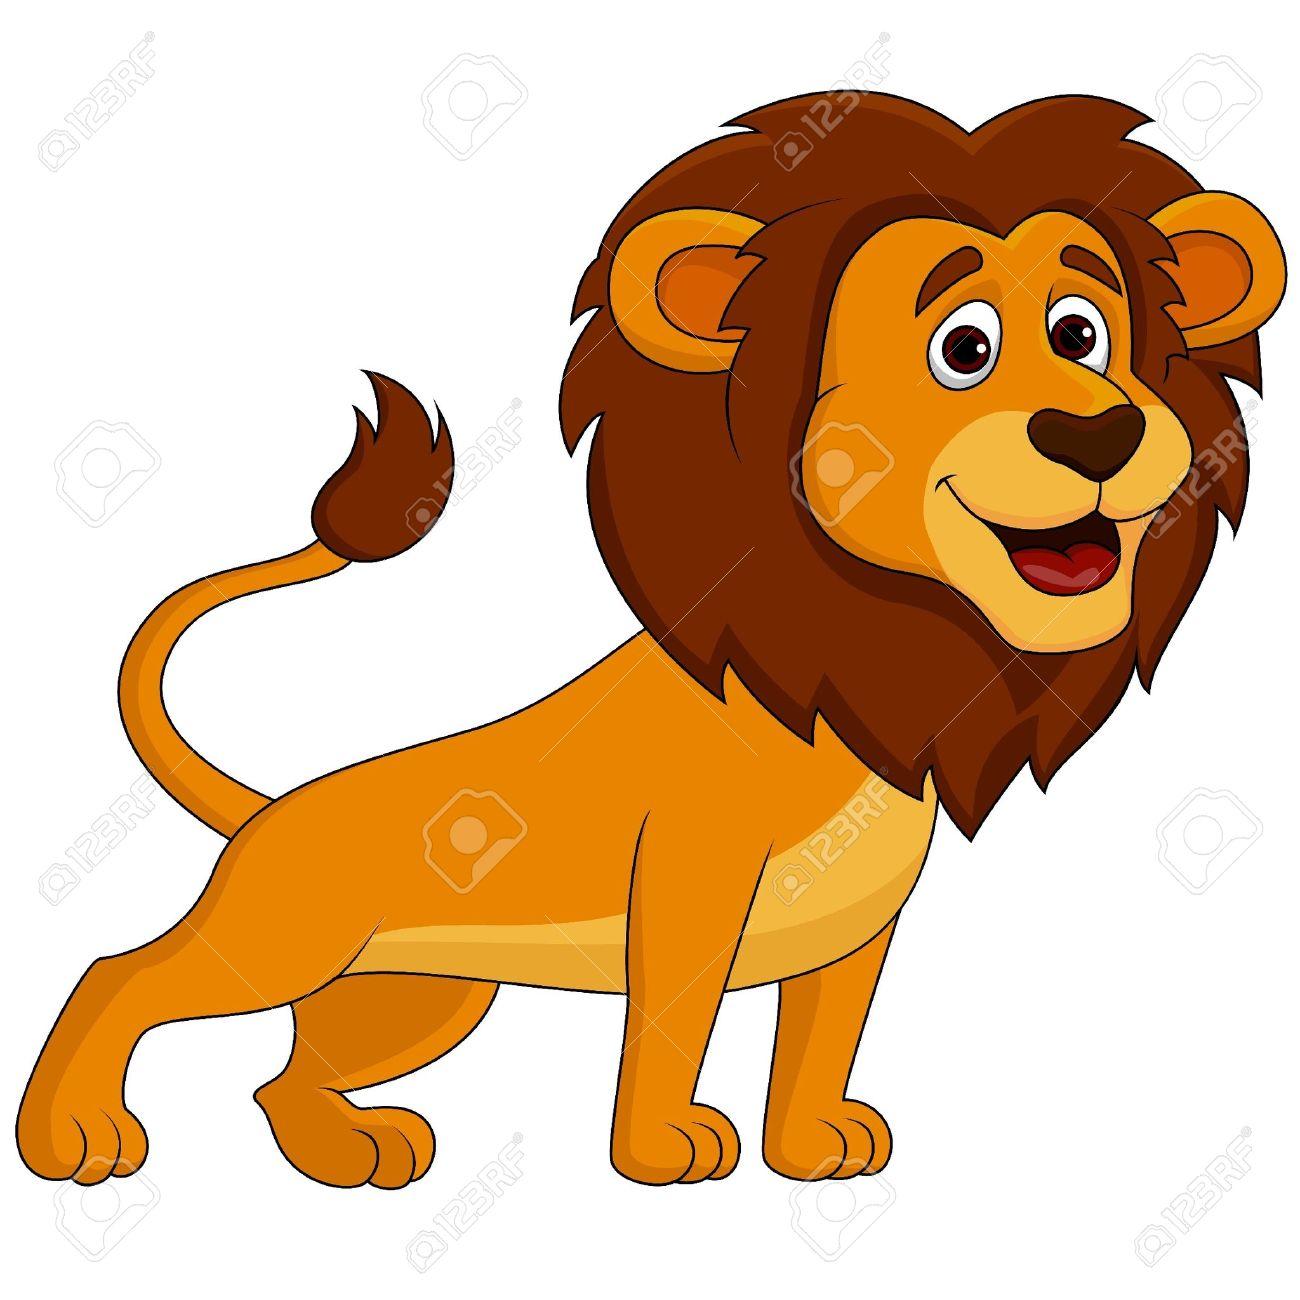 Cute Clipart Lion.